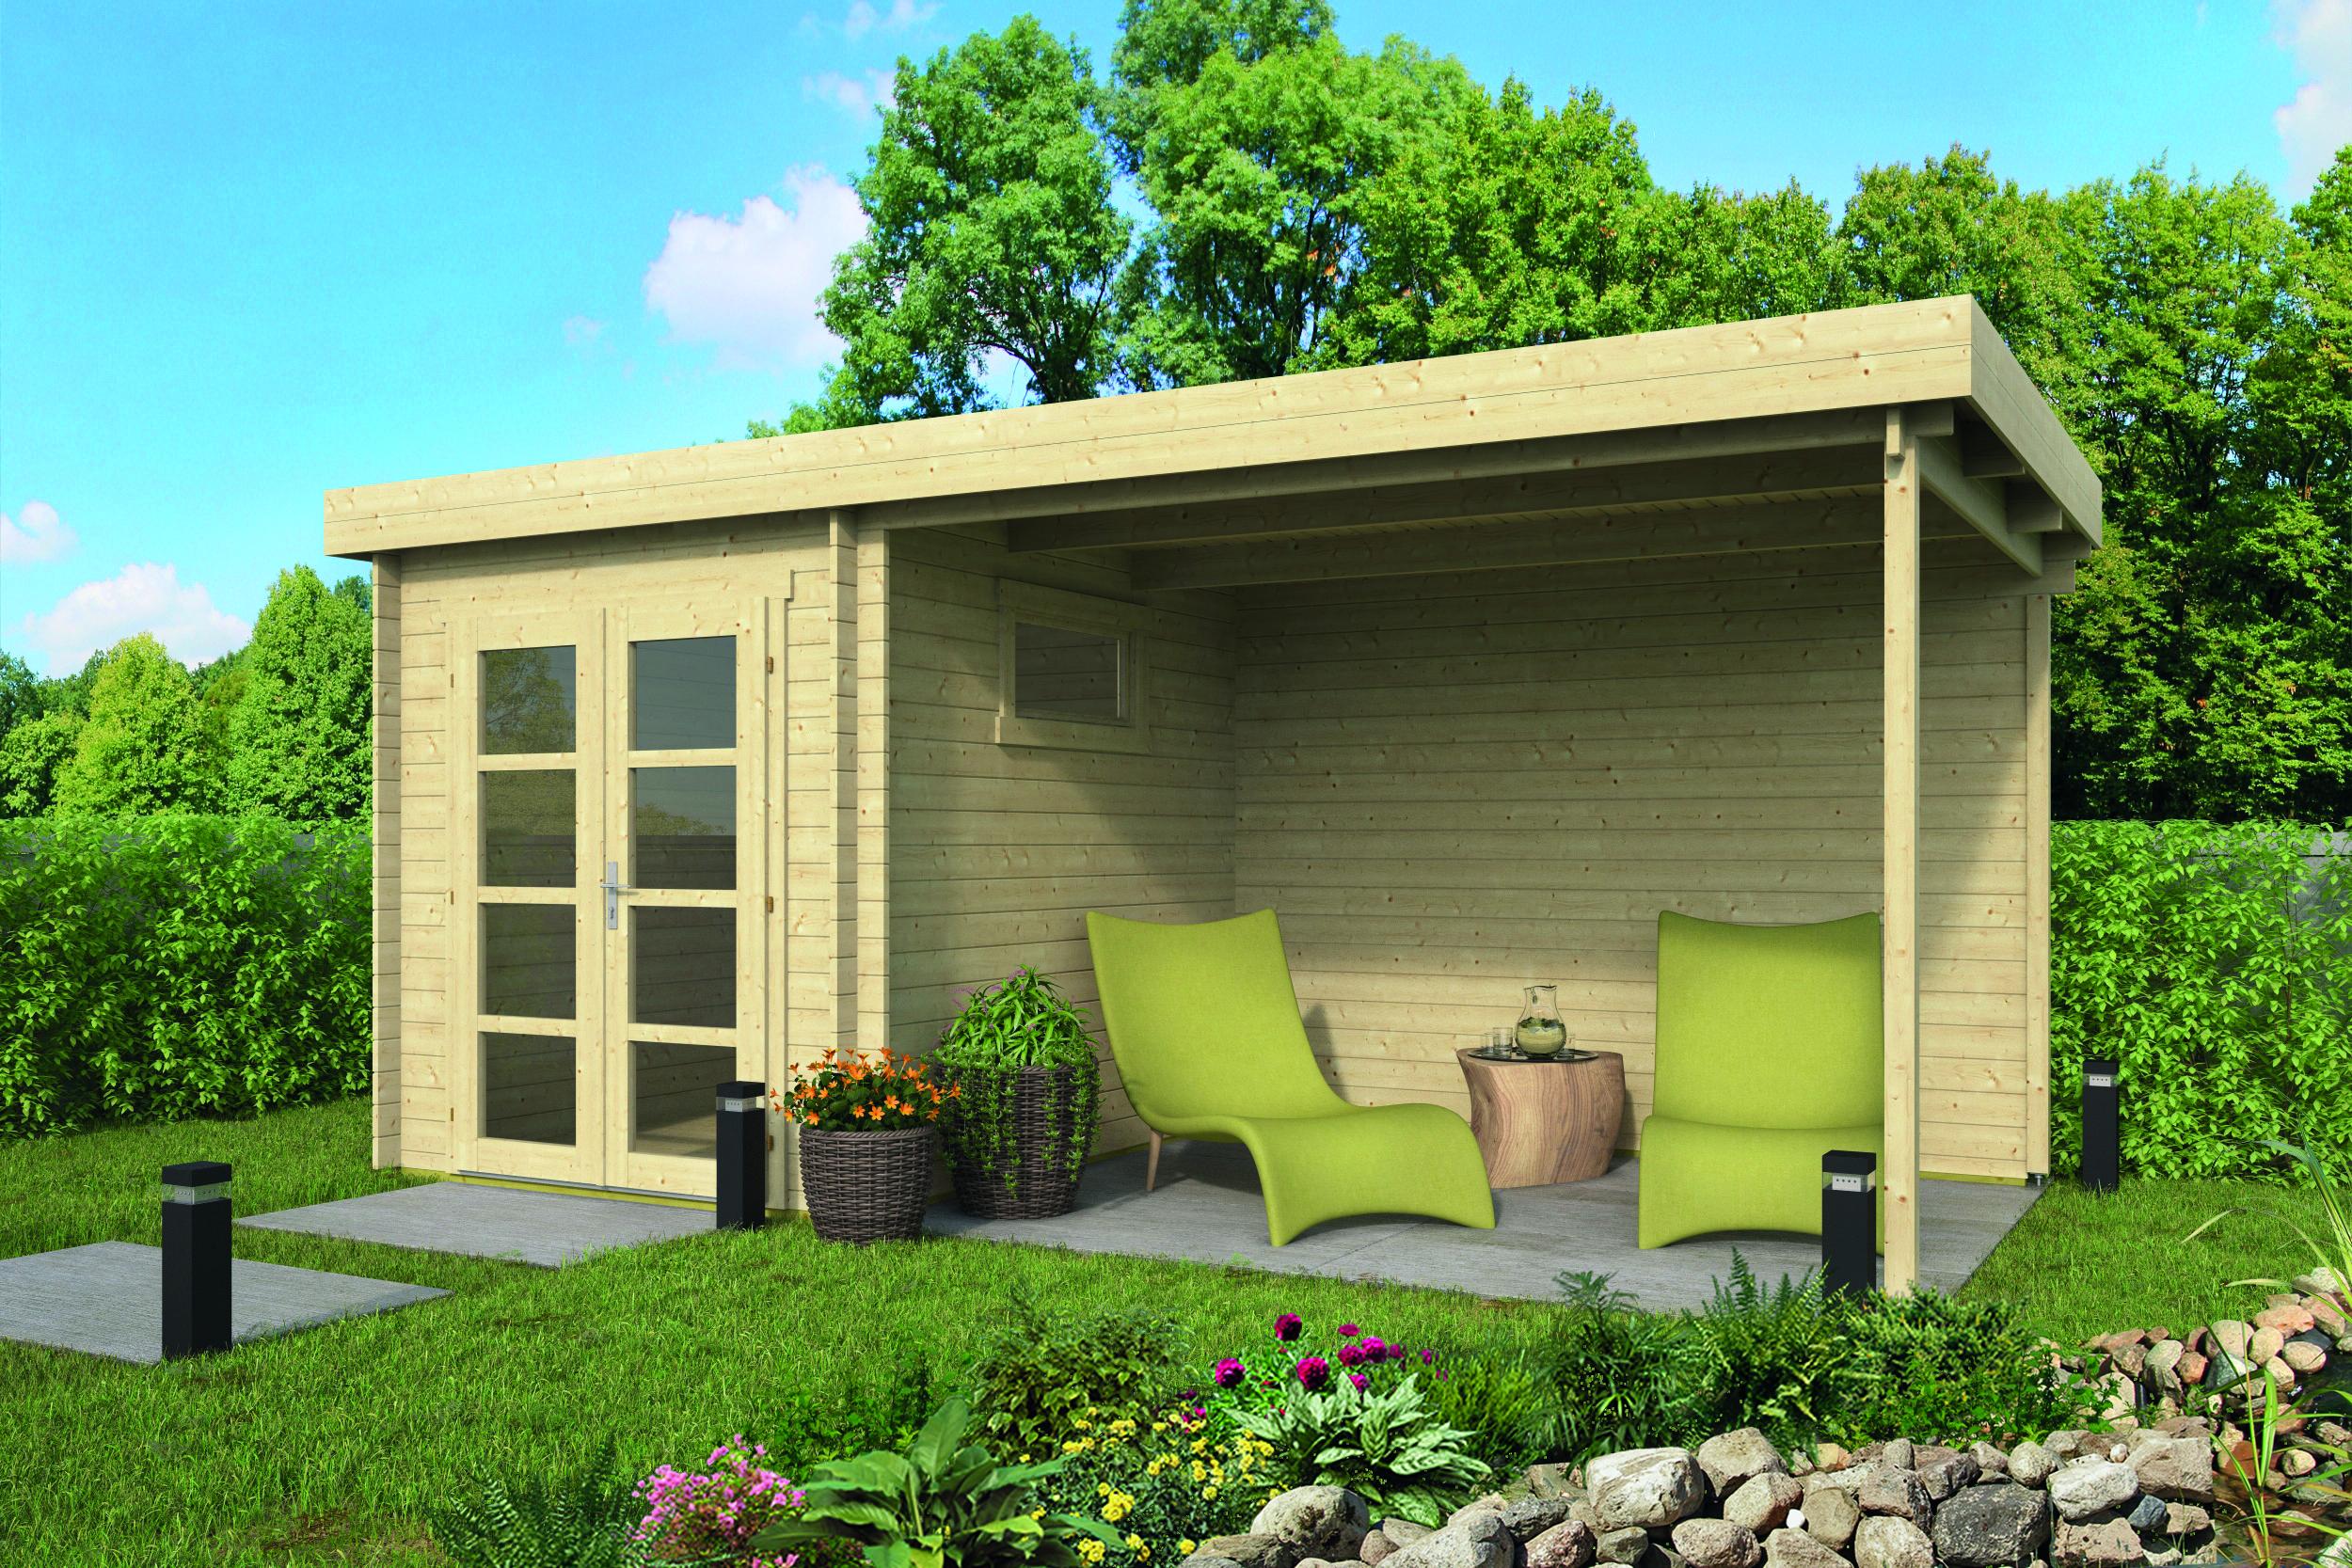 Erickson – Log Cabin /Garden Shed